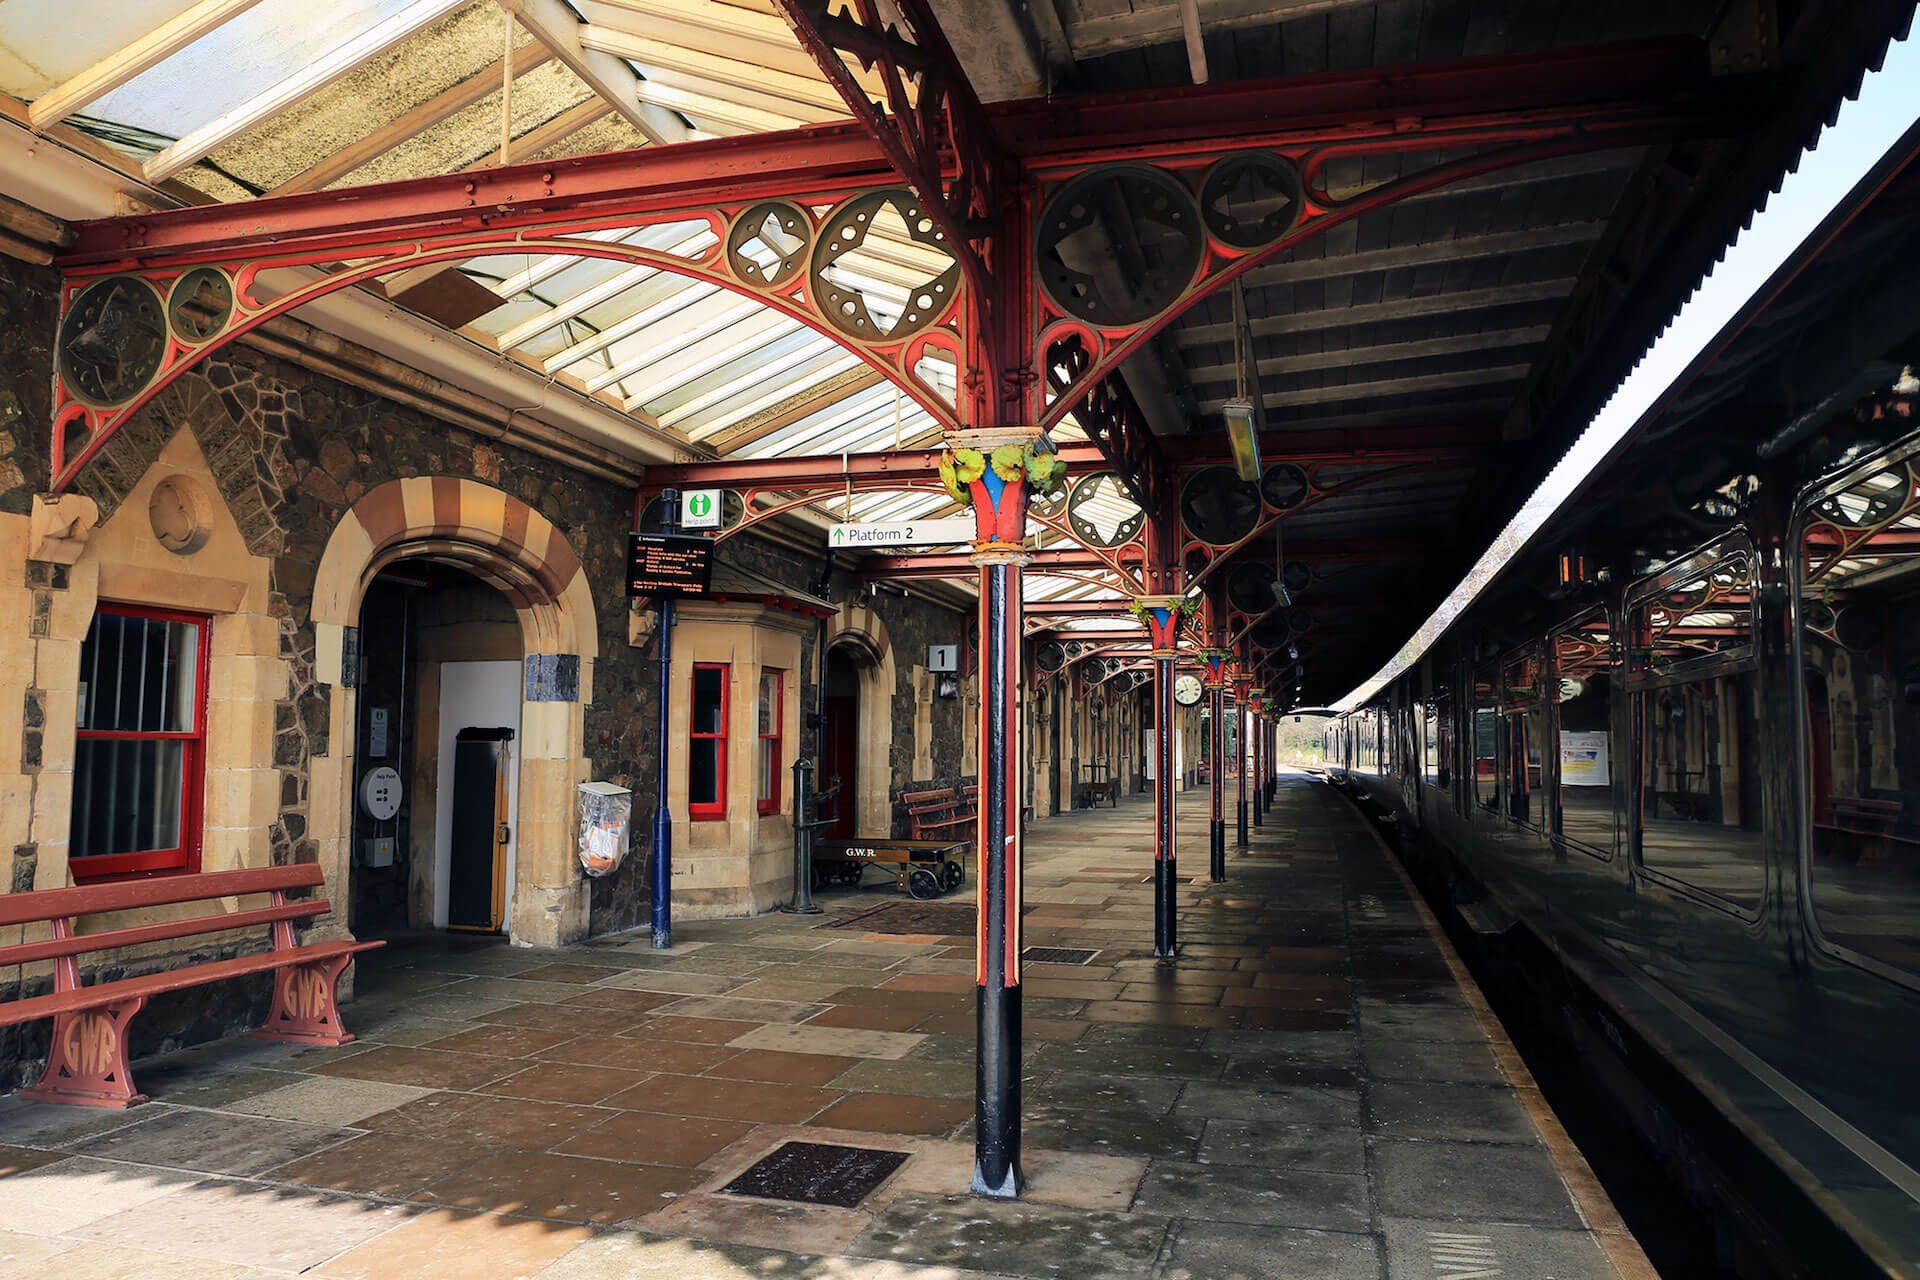 Great Malvern Station Platform